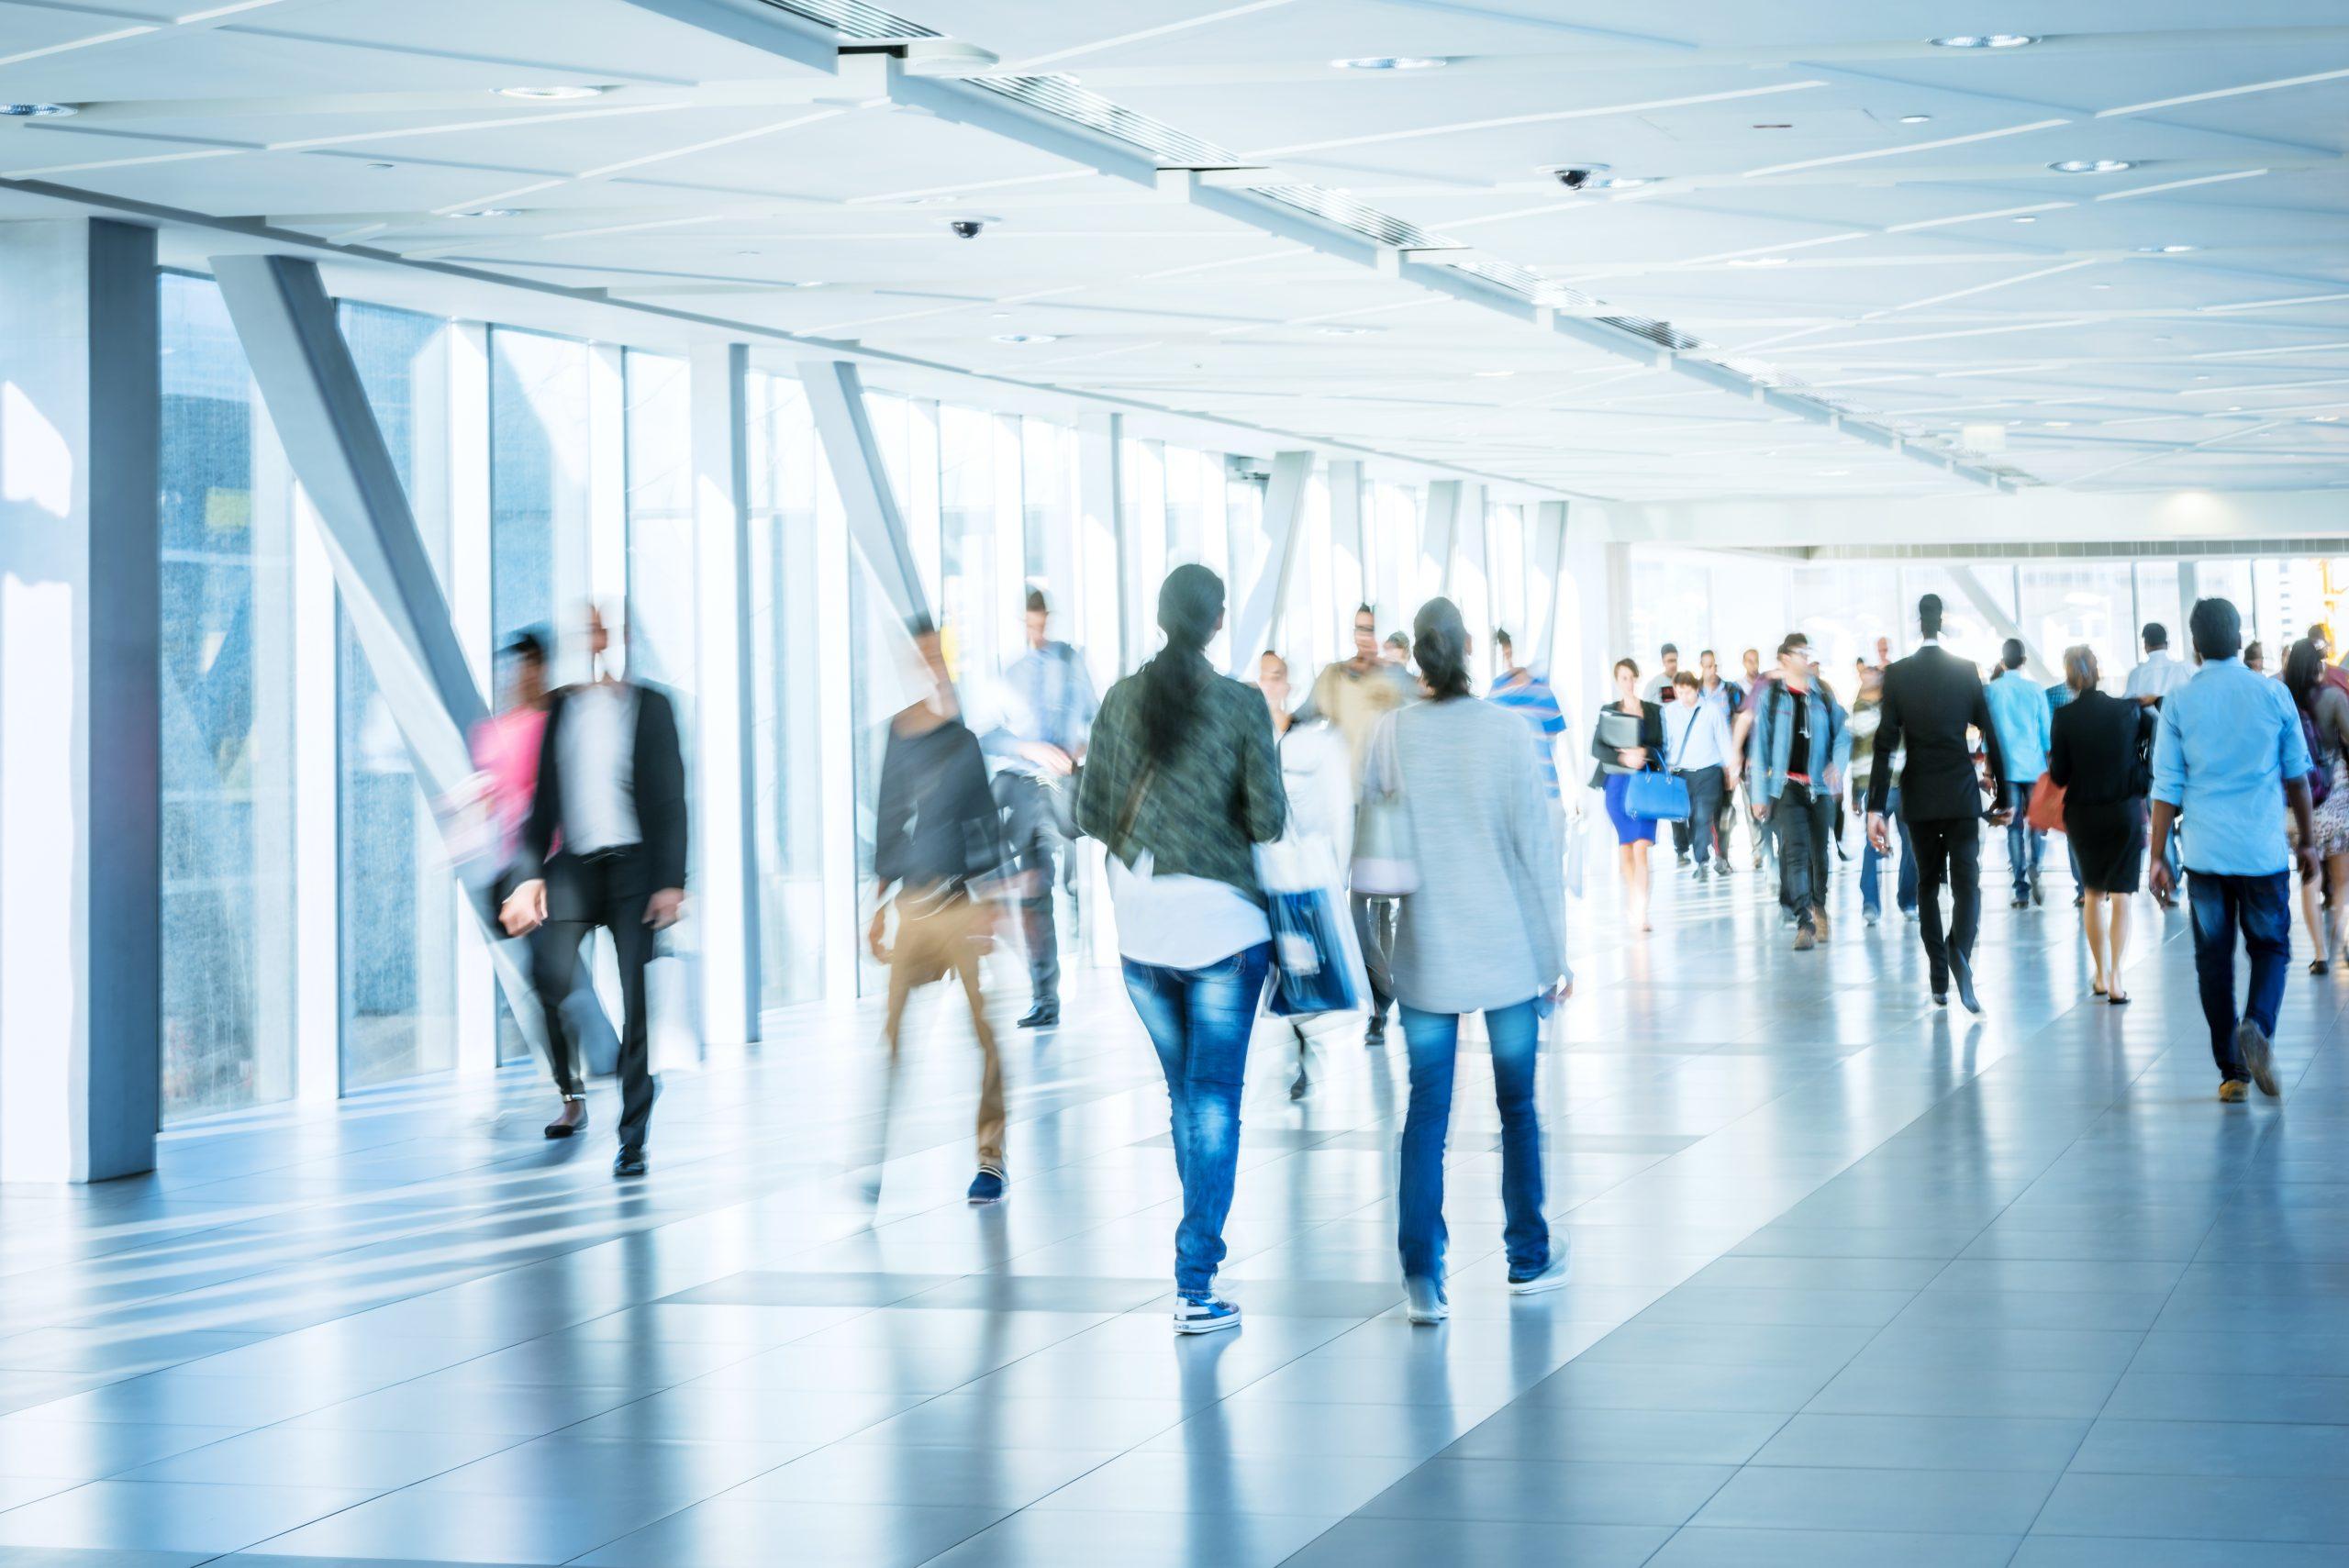 Muchas personas andando